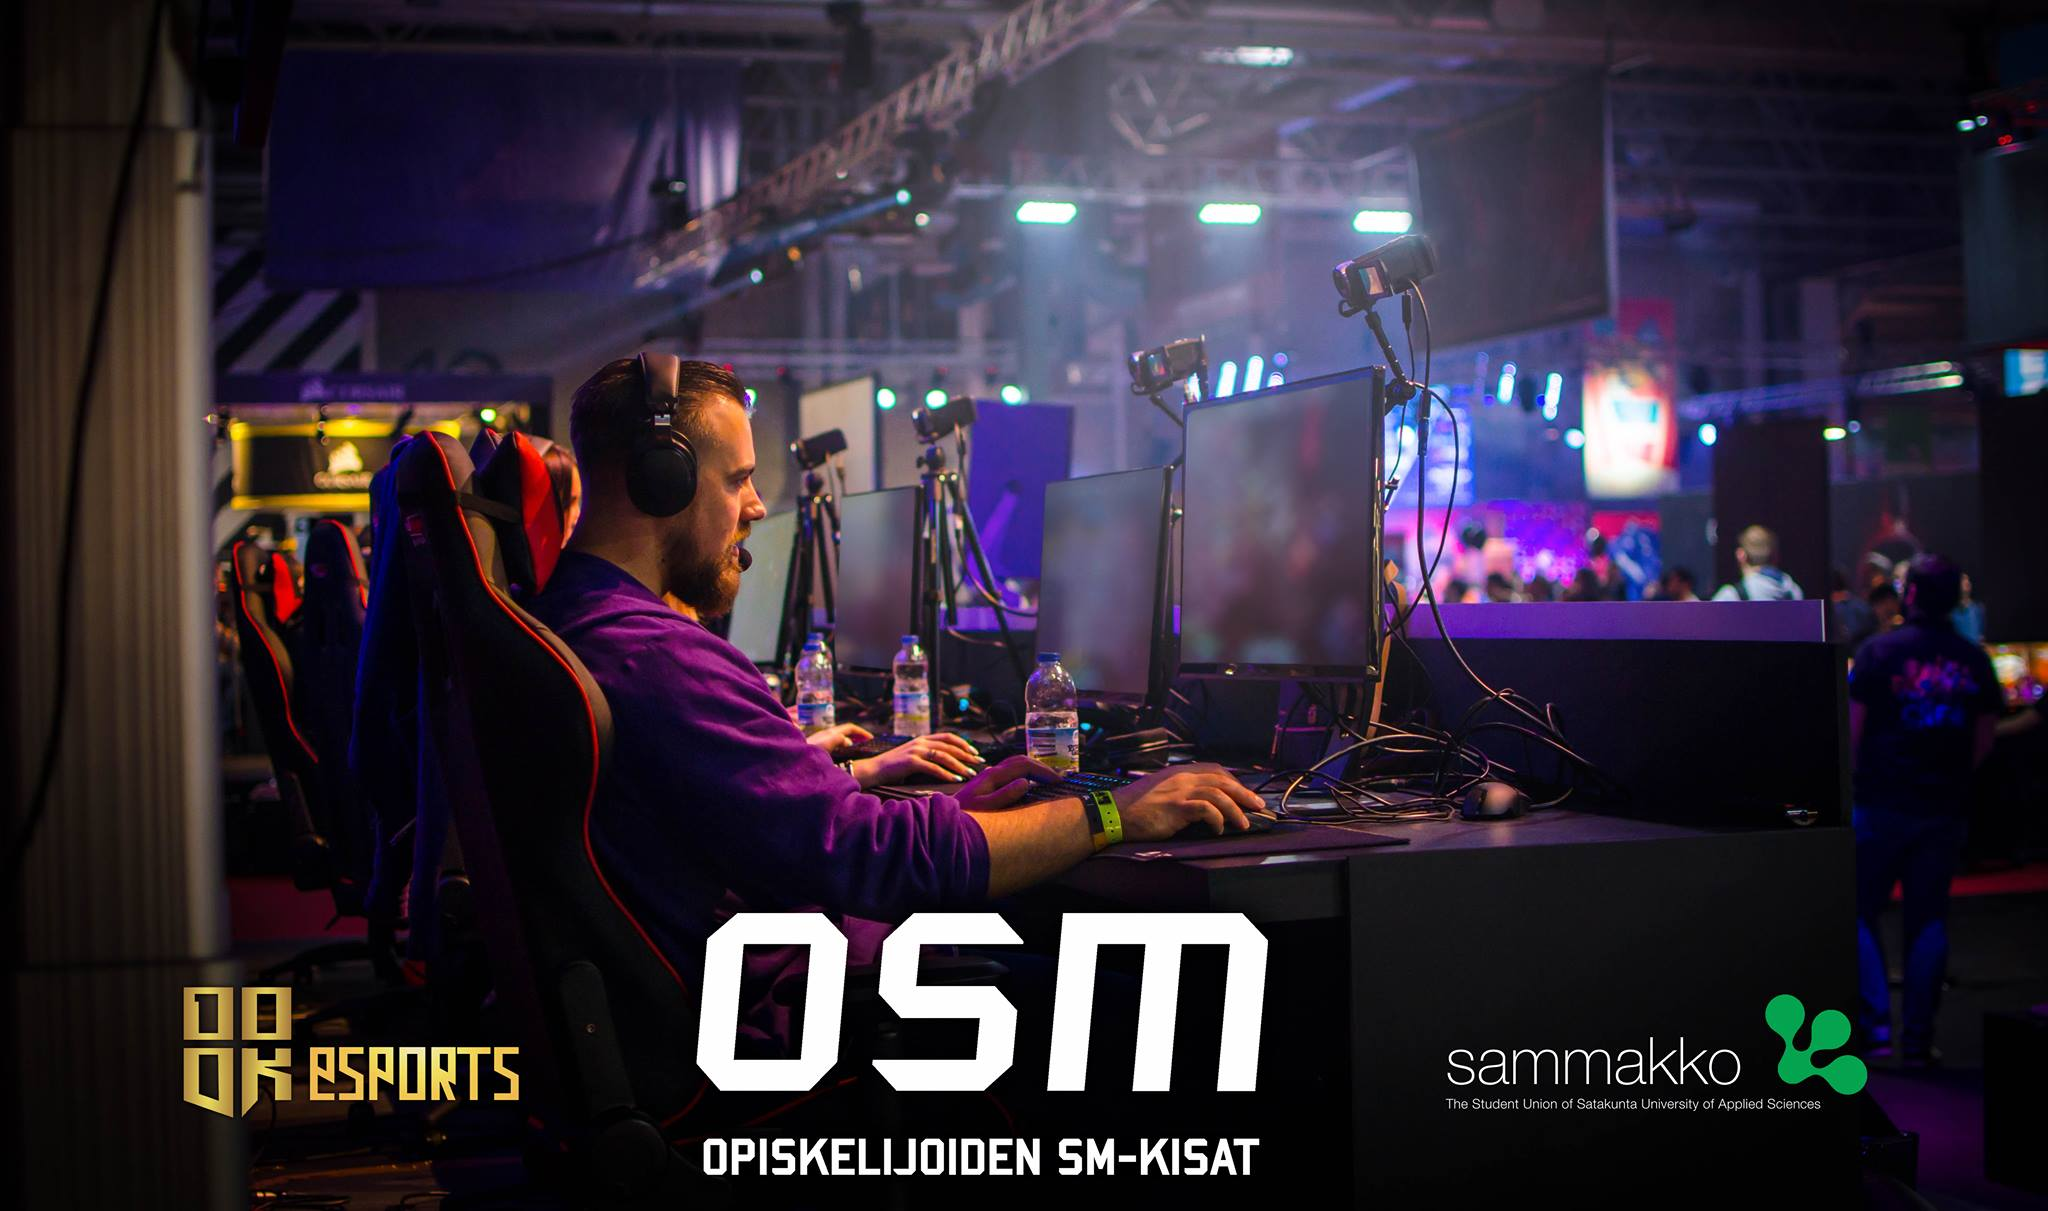 Counter-Strike: Global Offensiven Opiskelijoiden eSM-kisat